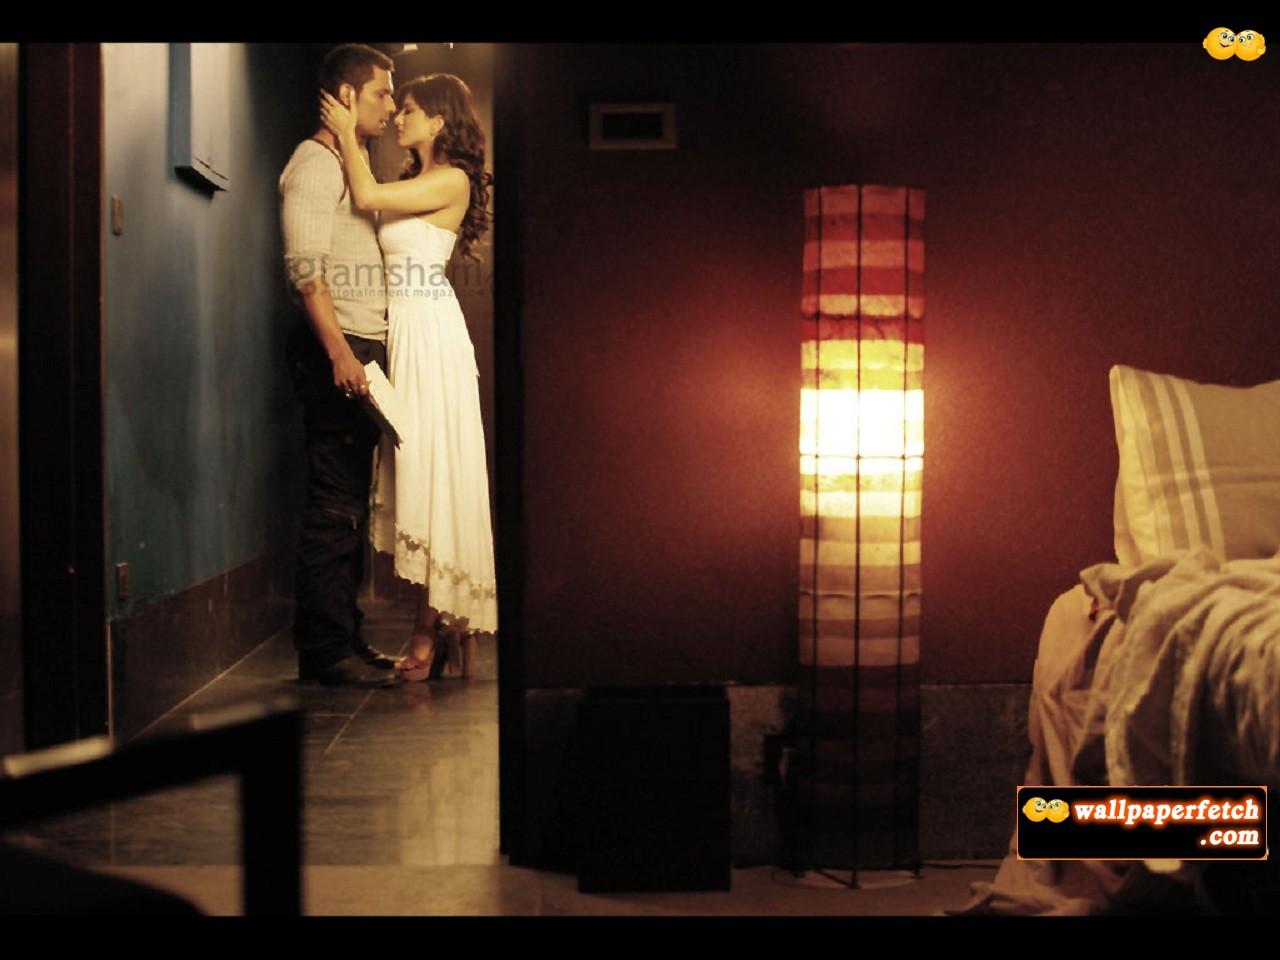 No Girls Wallpaper Wallpaper Fetch Jism 2 Movie Wallpapers 2012